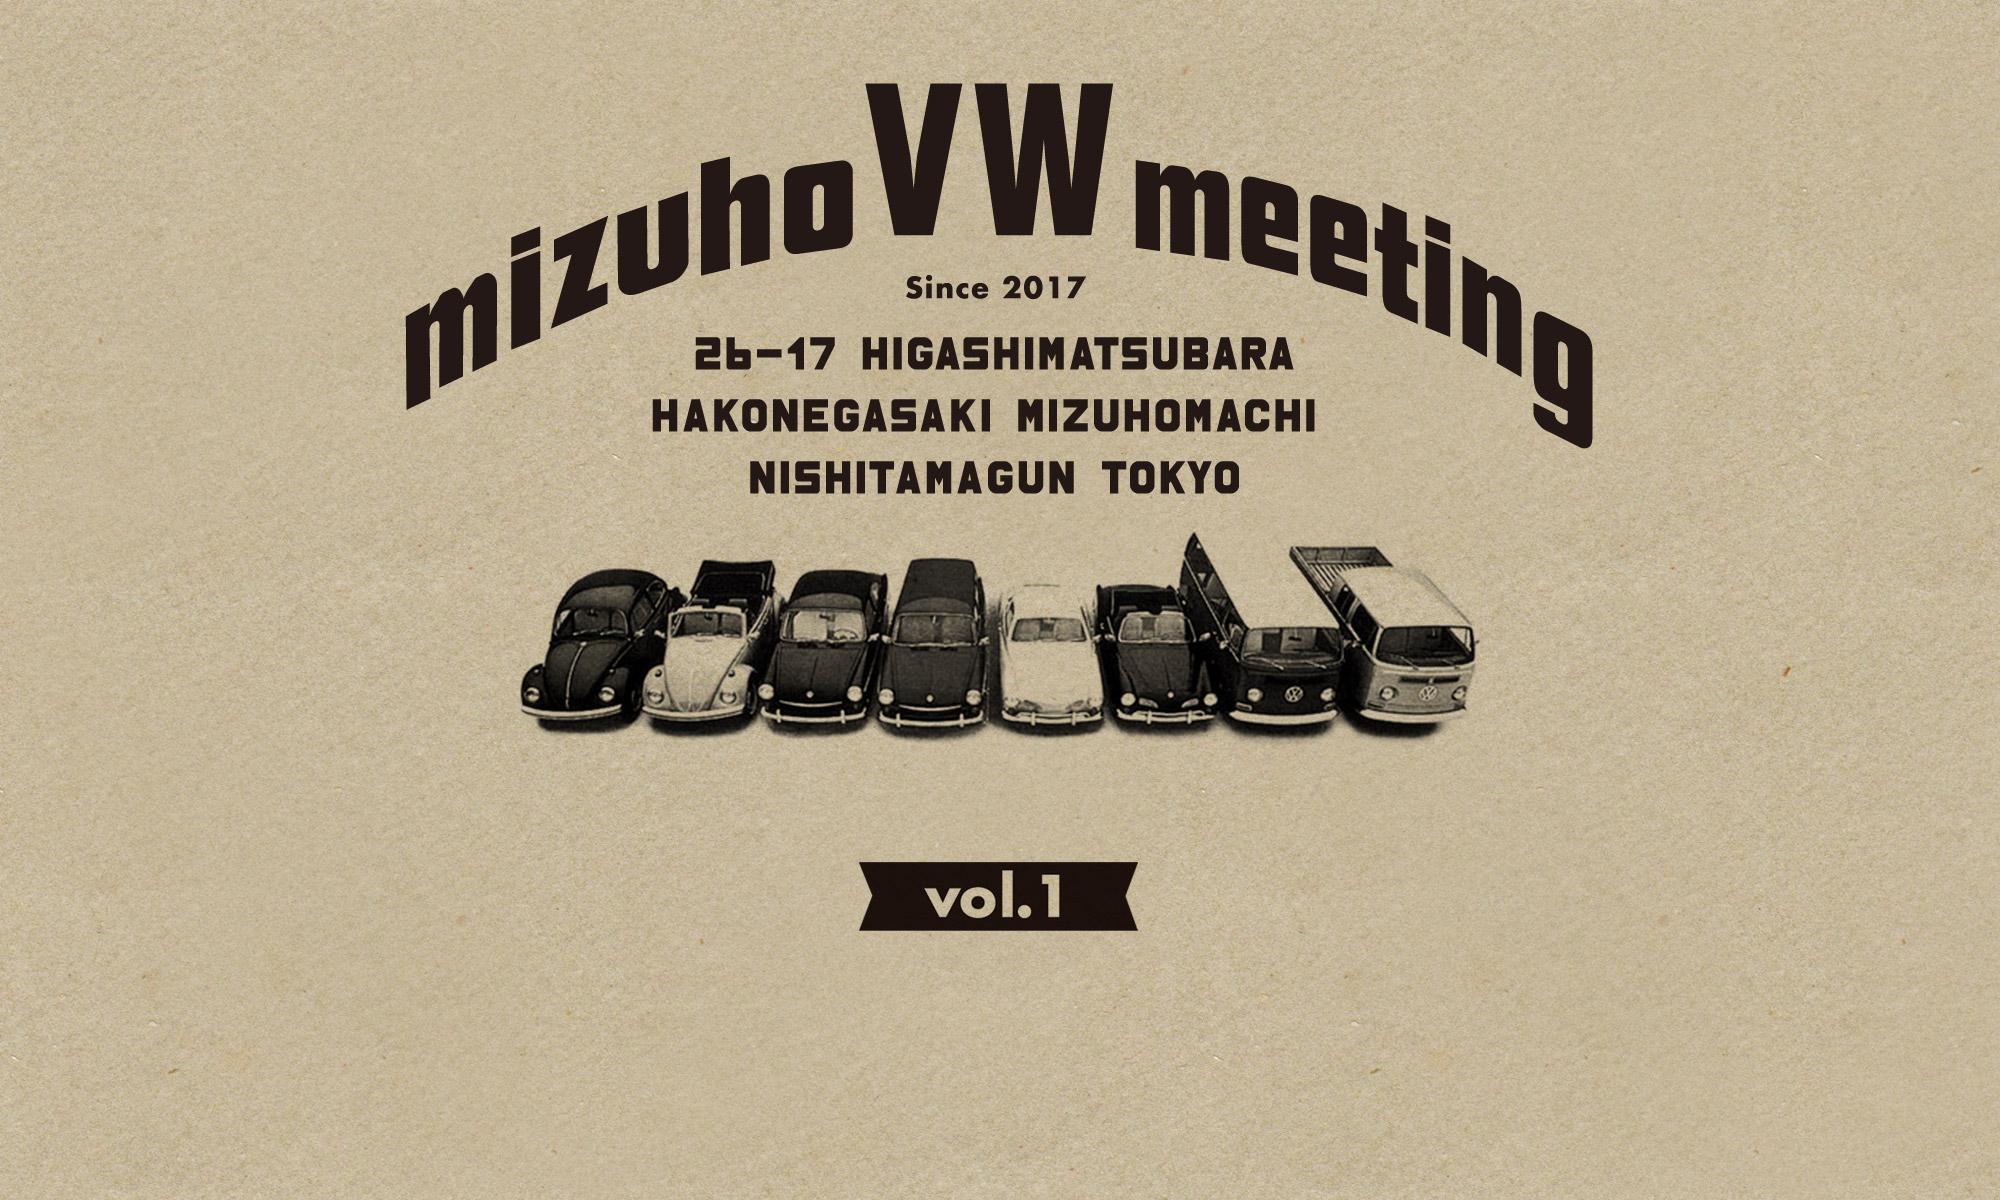 mizuho VW meeting Vol.1